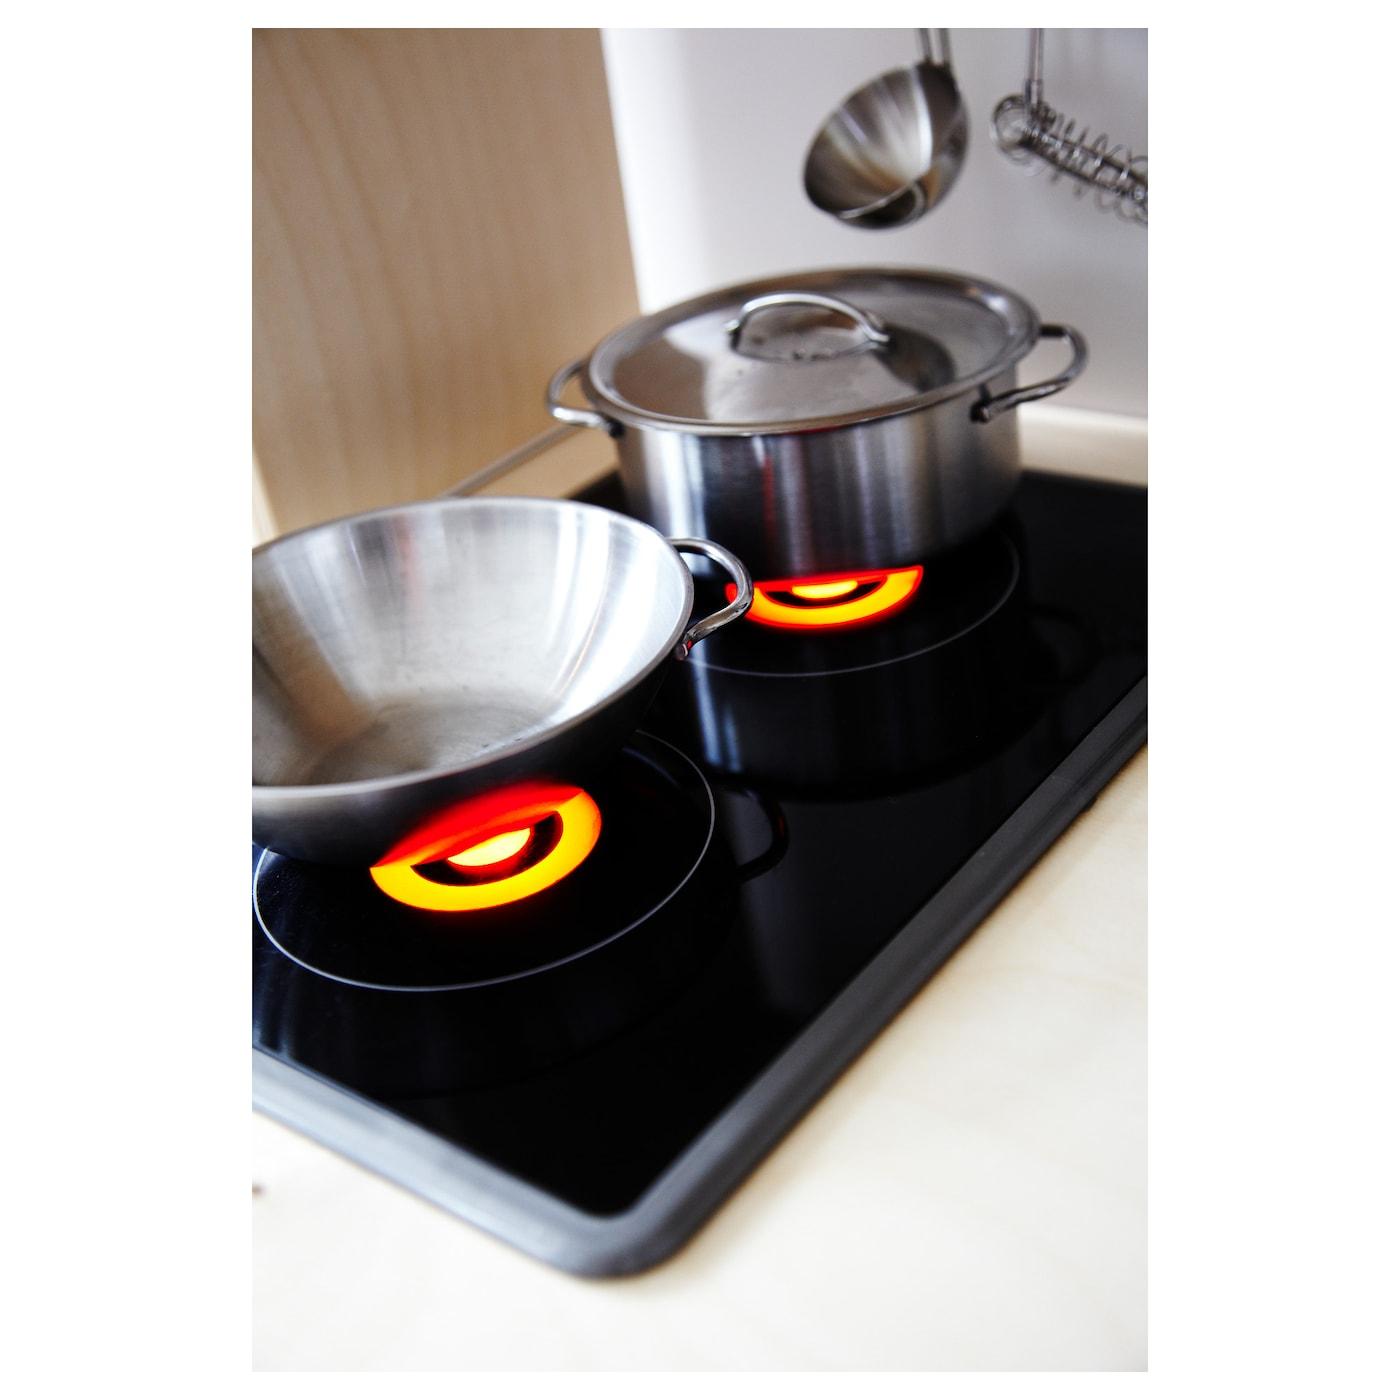 duktig ustensiles cuisson enfant 5 pi ces couleur acier inox ikea. Black Bedroom Furniture Sets. Home Design Ideas